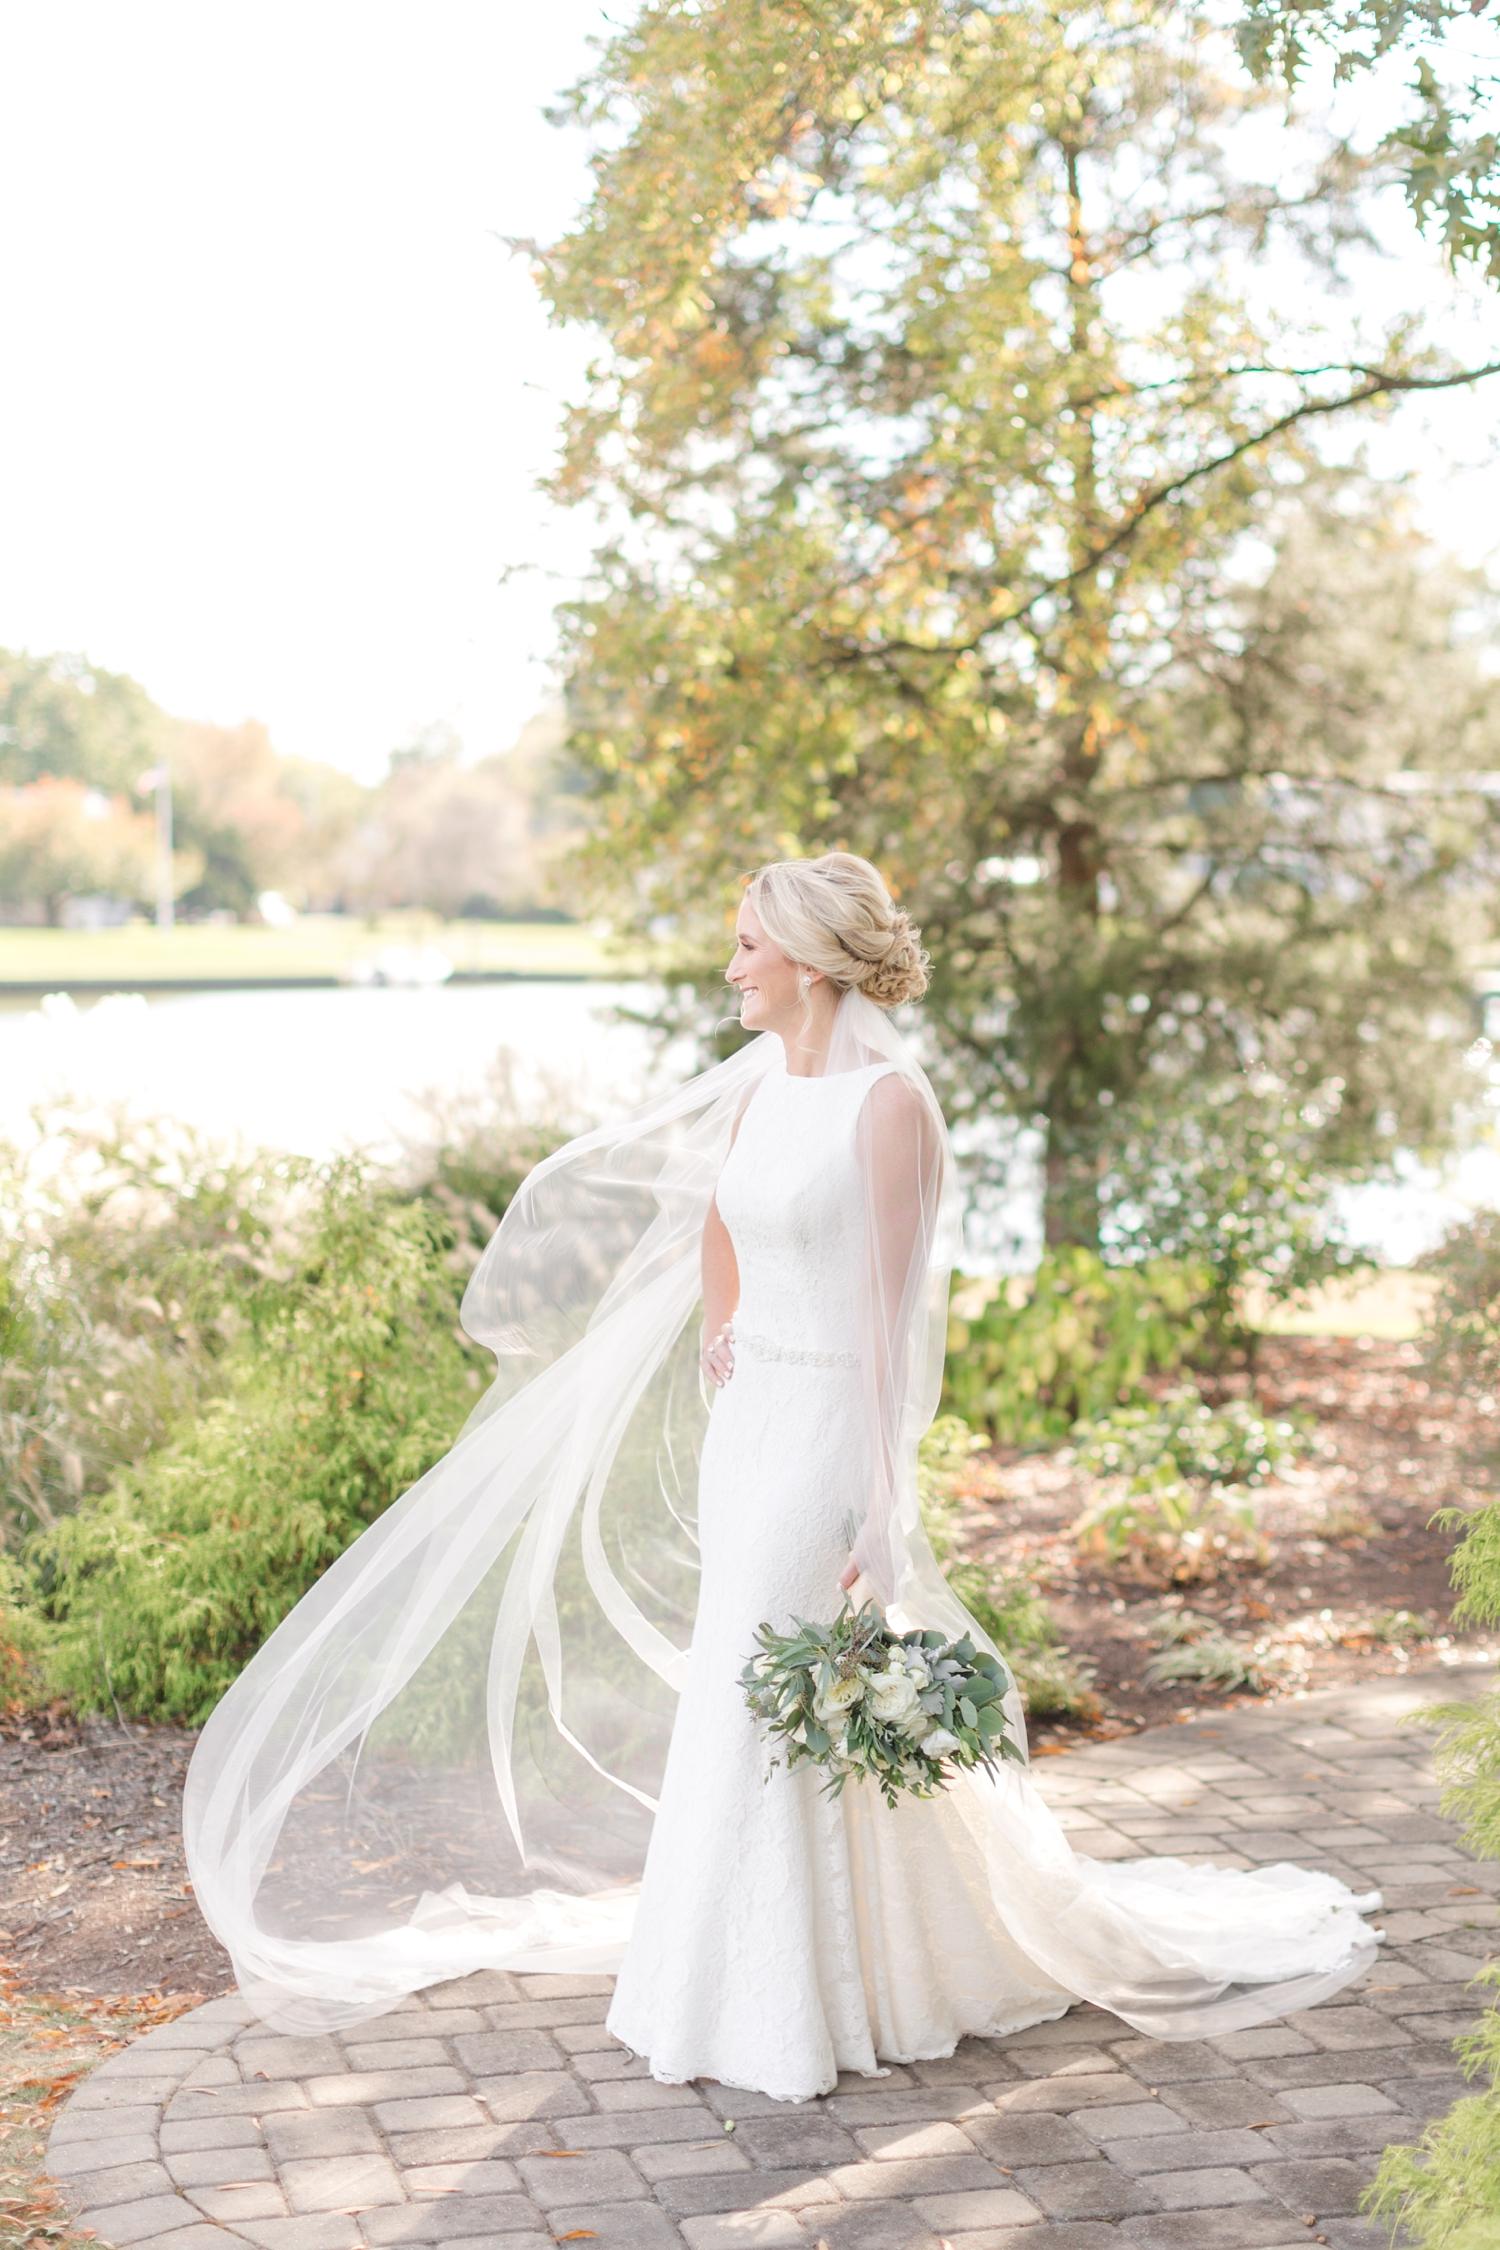 Wojciechowski Wedding-188_maryland-and-virginia-wedding-photographer-anna-grace-photography-photo.jpg